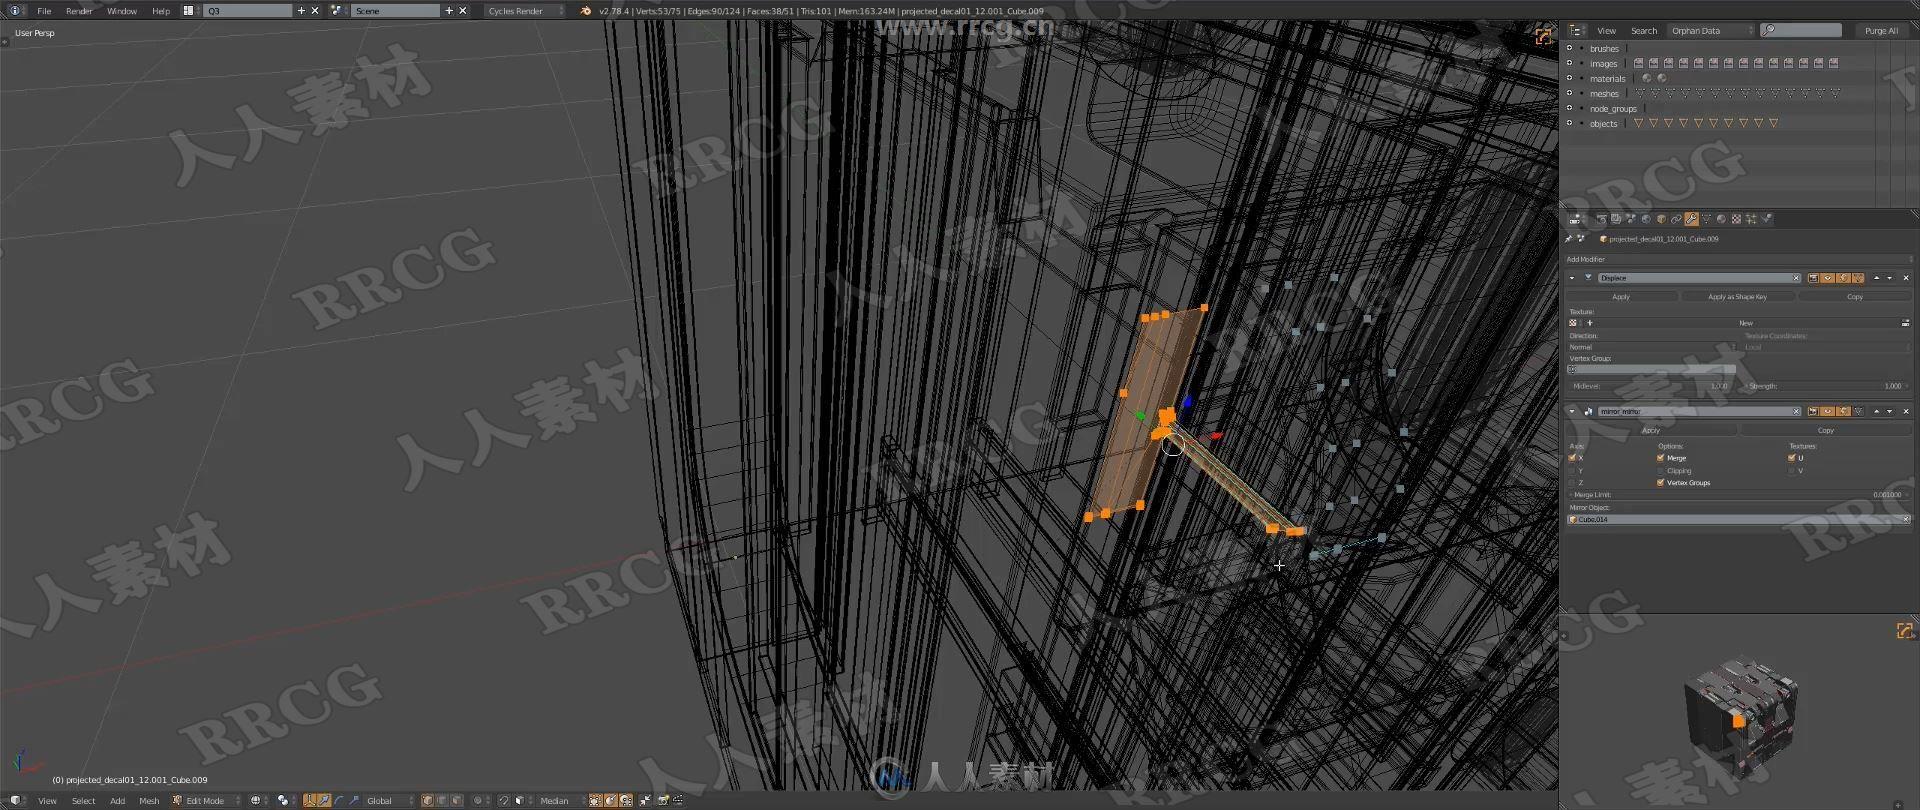 Hardops 00986 Mercury科幻机械硬表面建模Blender插件V13版